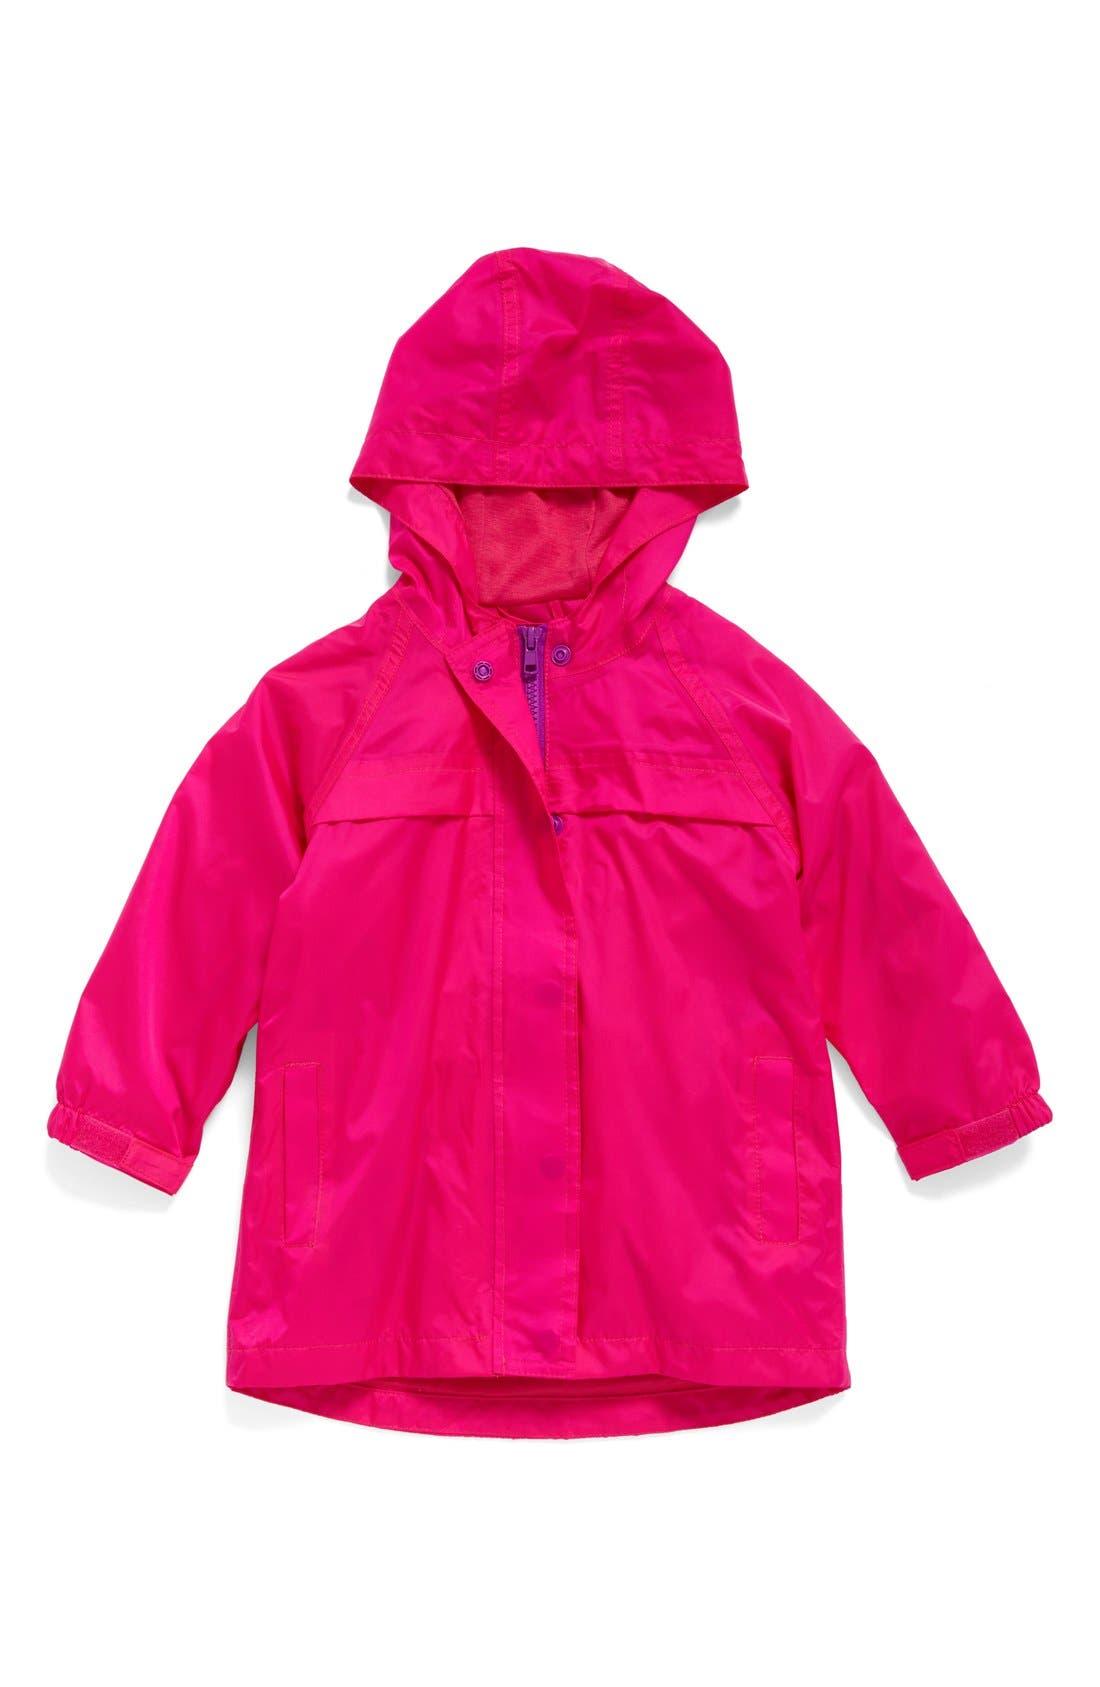 Hooded Raincoat,                             Main thumbnail 1, color,                             PINK